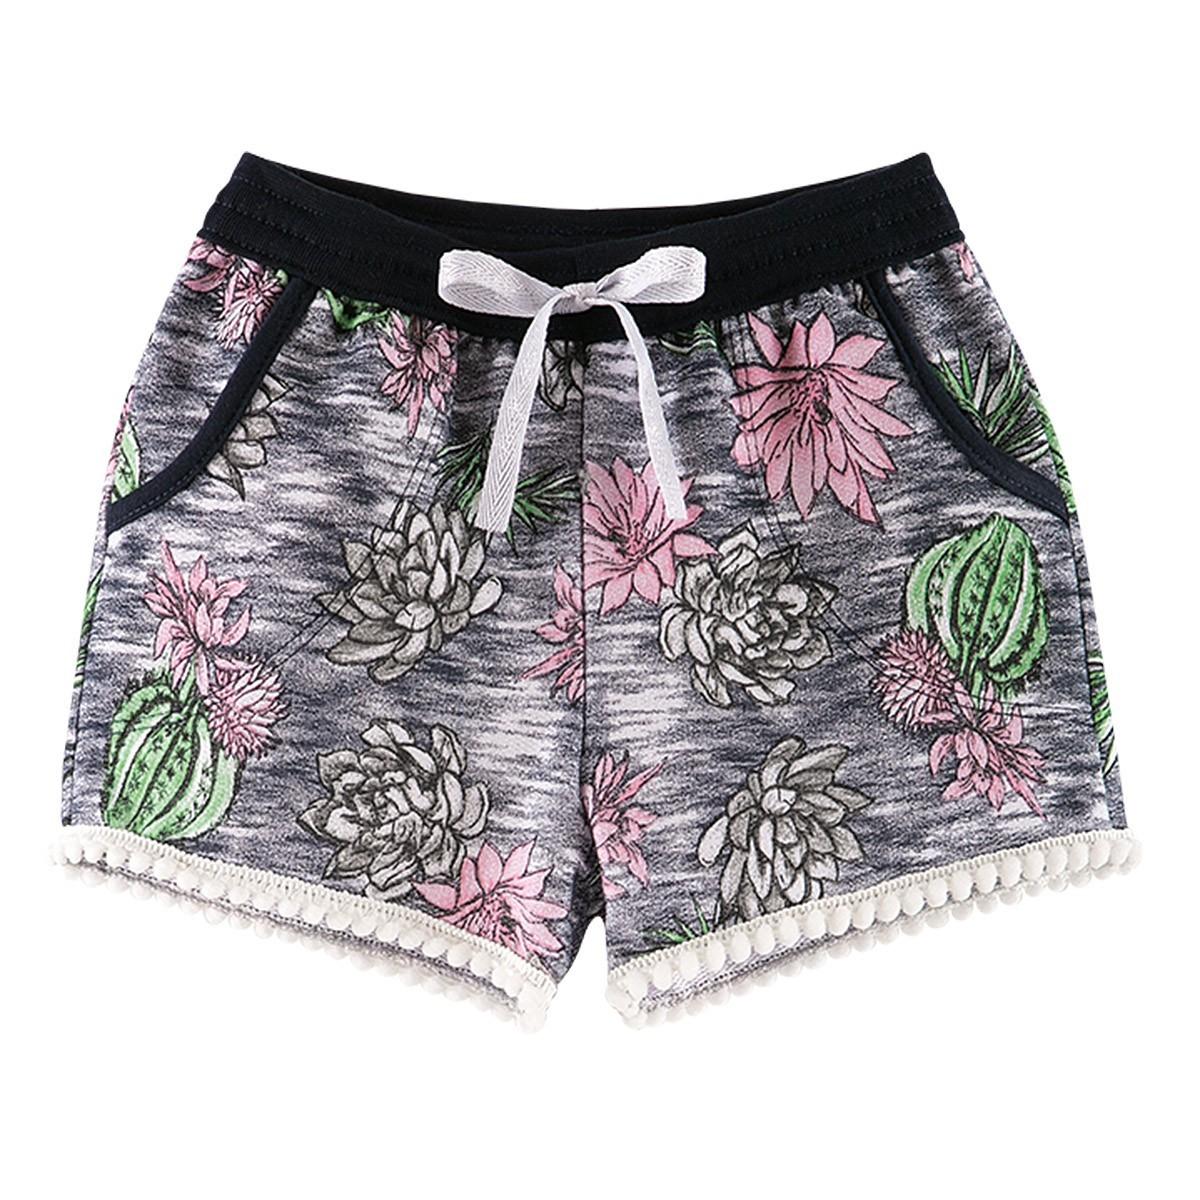 Shorts Infantil Menina Estampada Floral Marinho - Fantoni